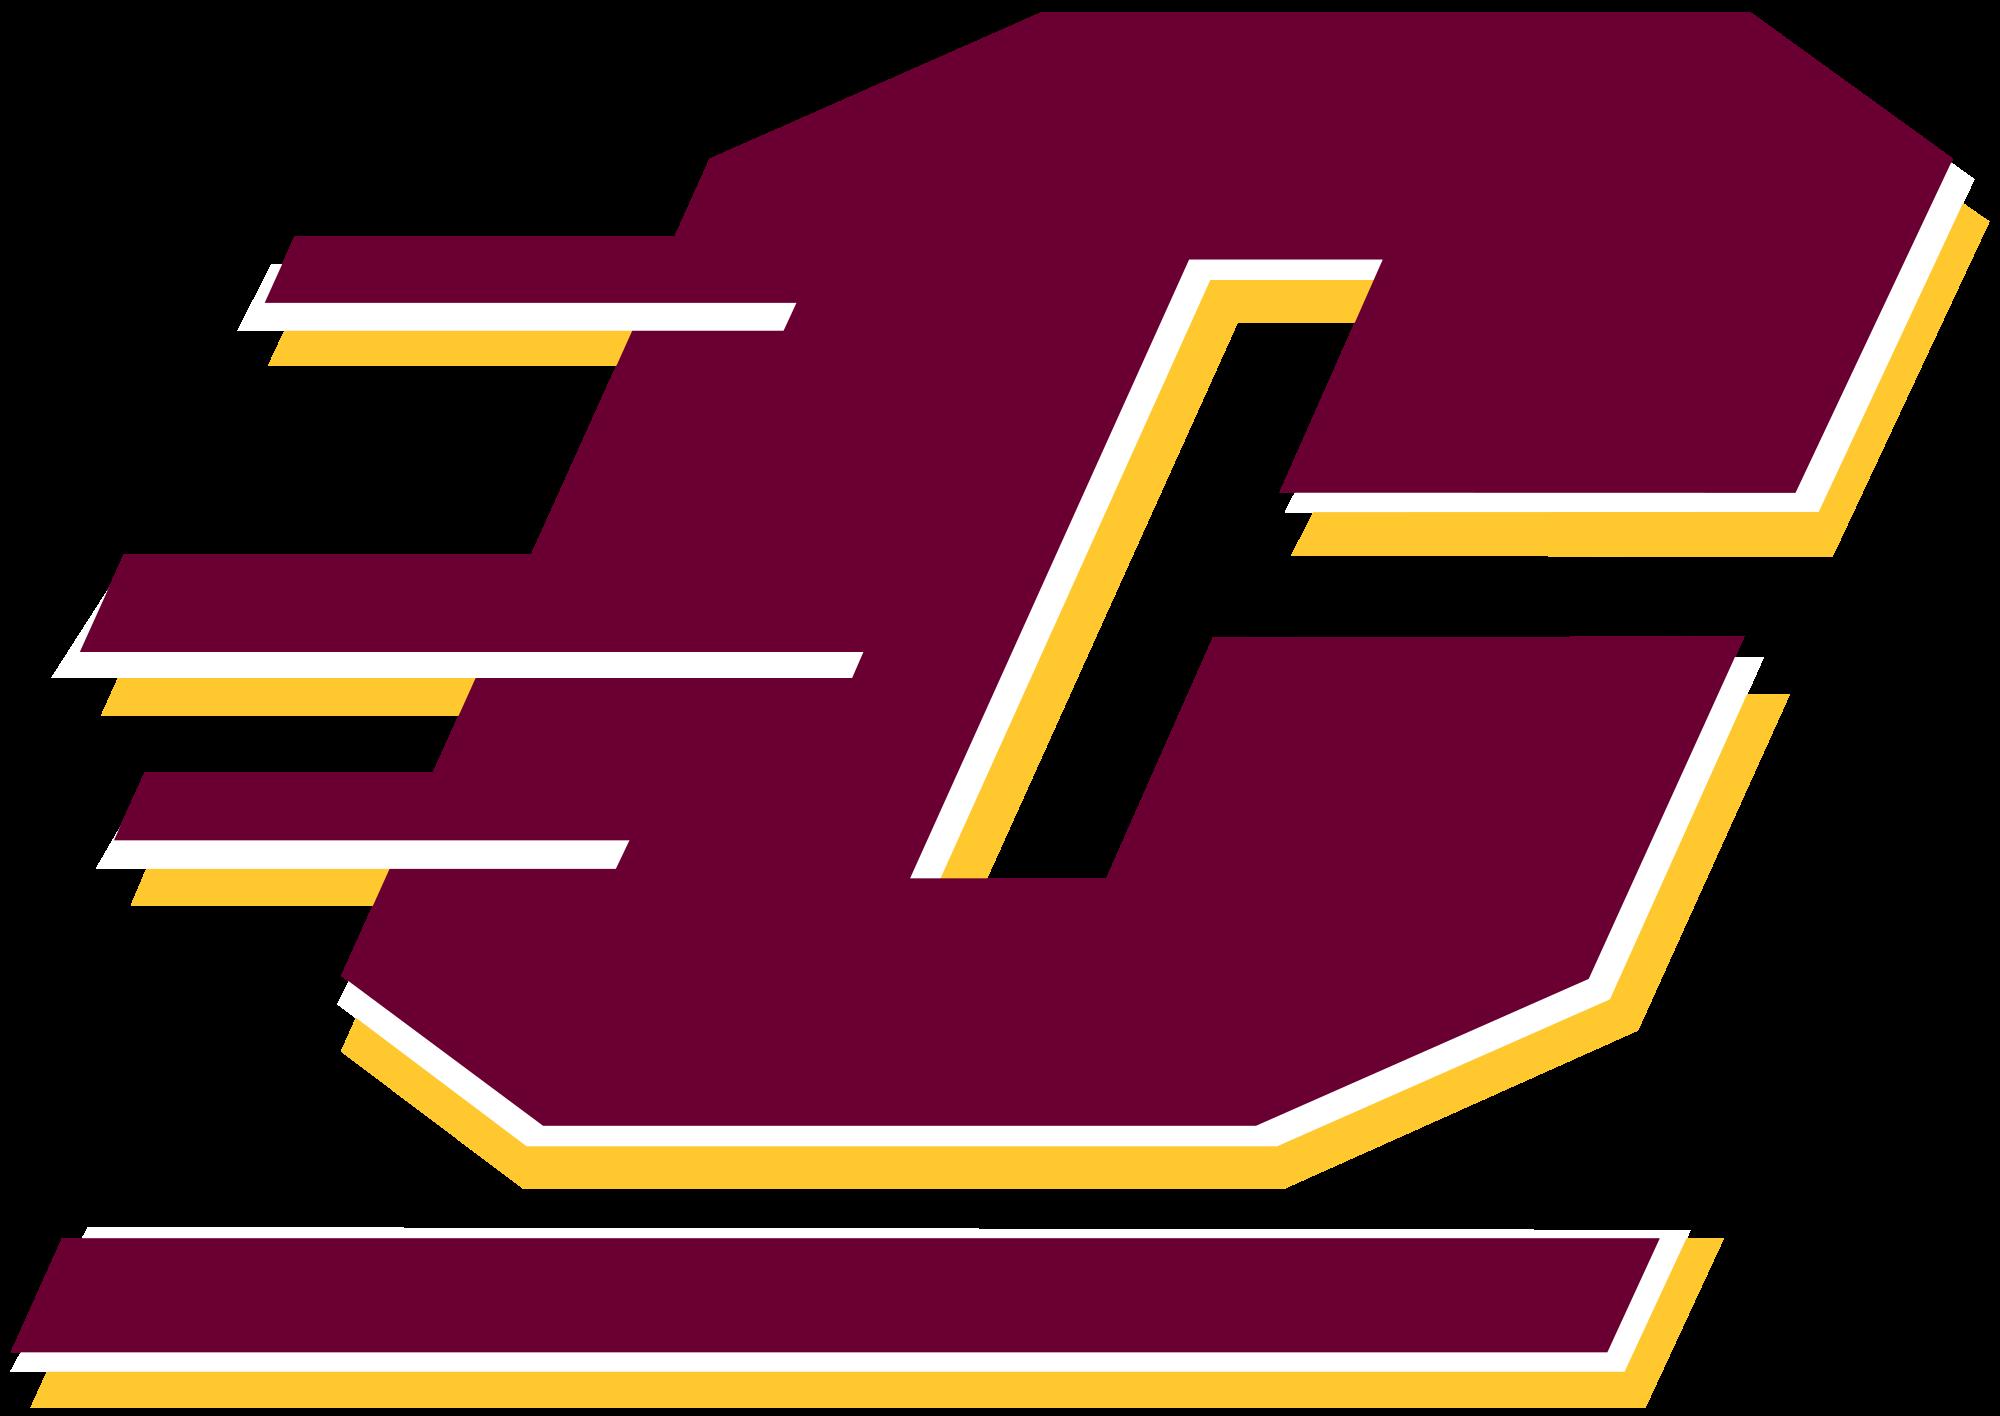 File central chippewas logo. Michigan clipart michigan university